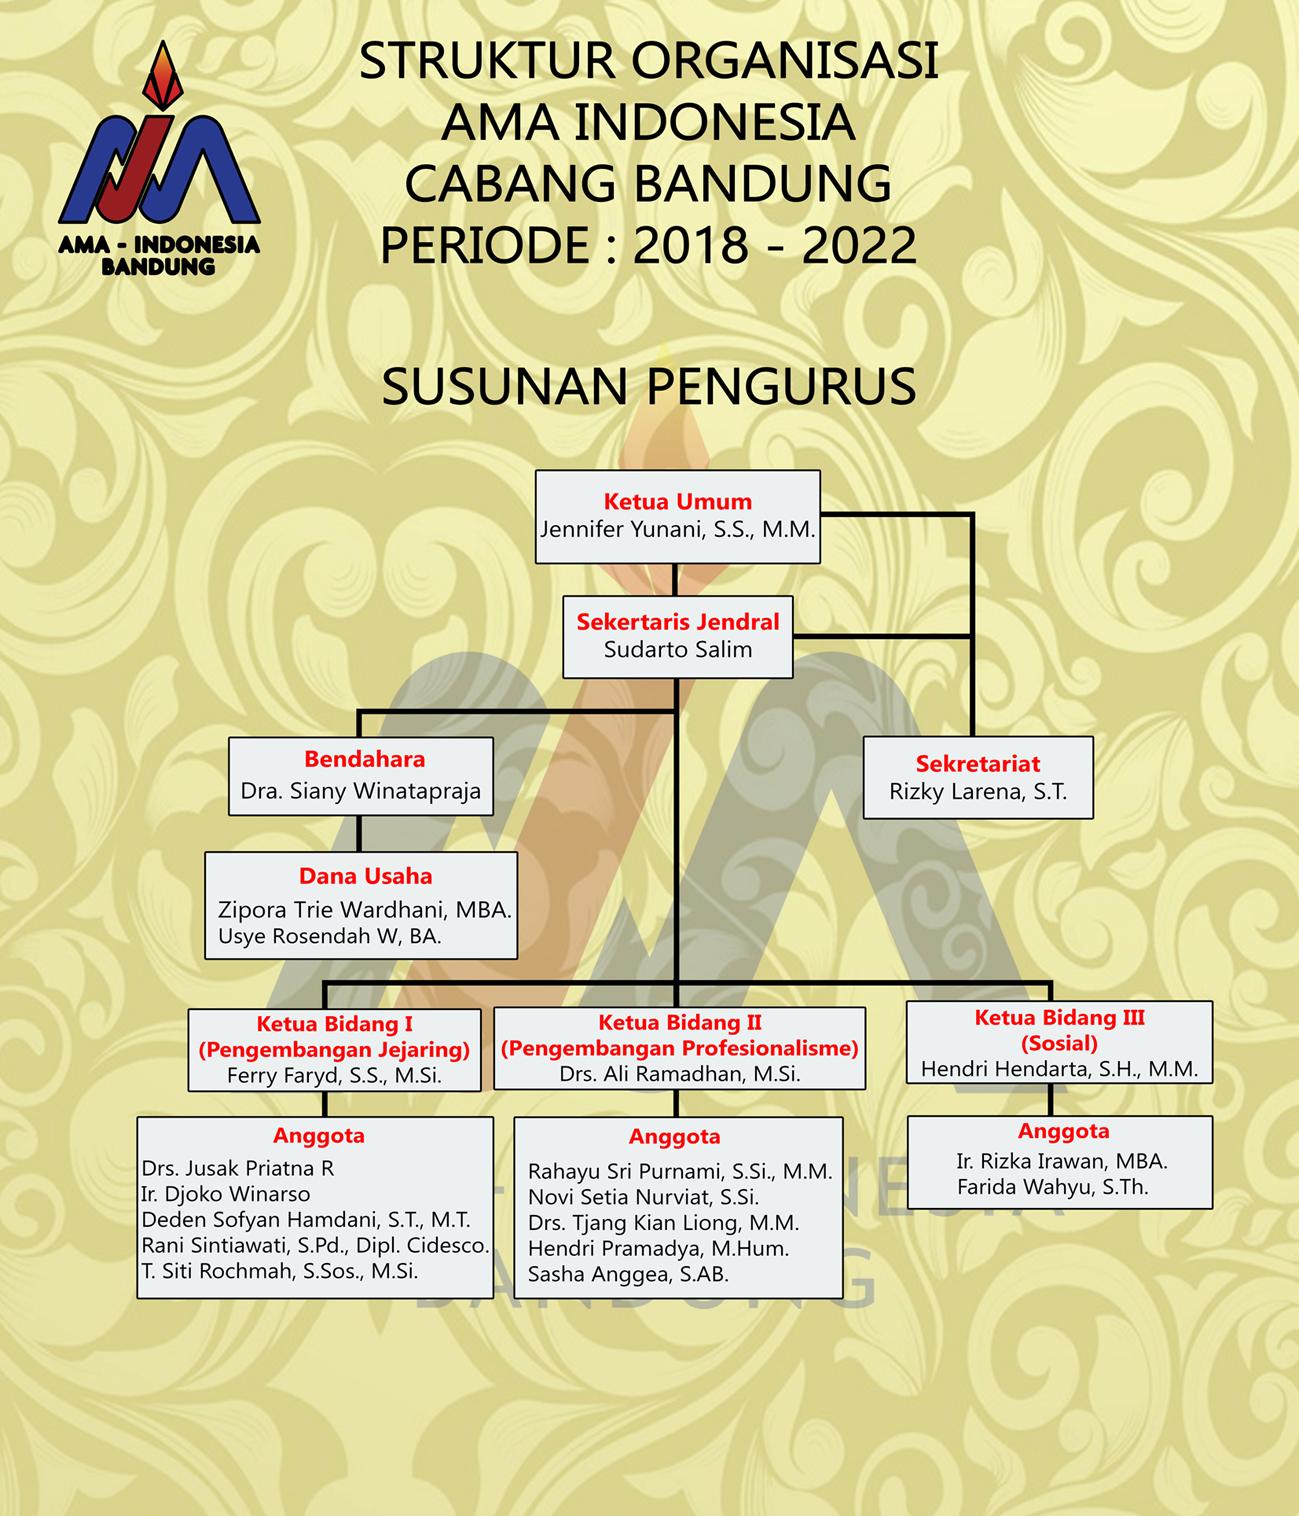 Struktur Organisasi AMA Bandung 2018 - 2022